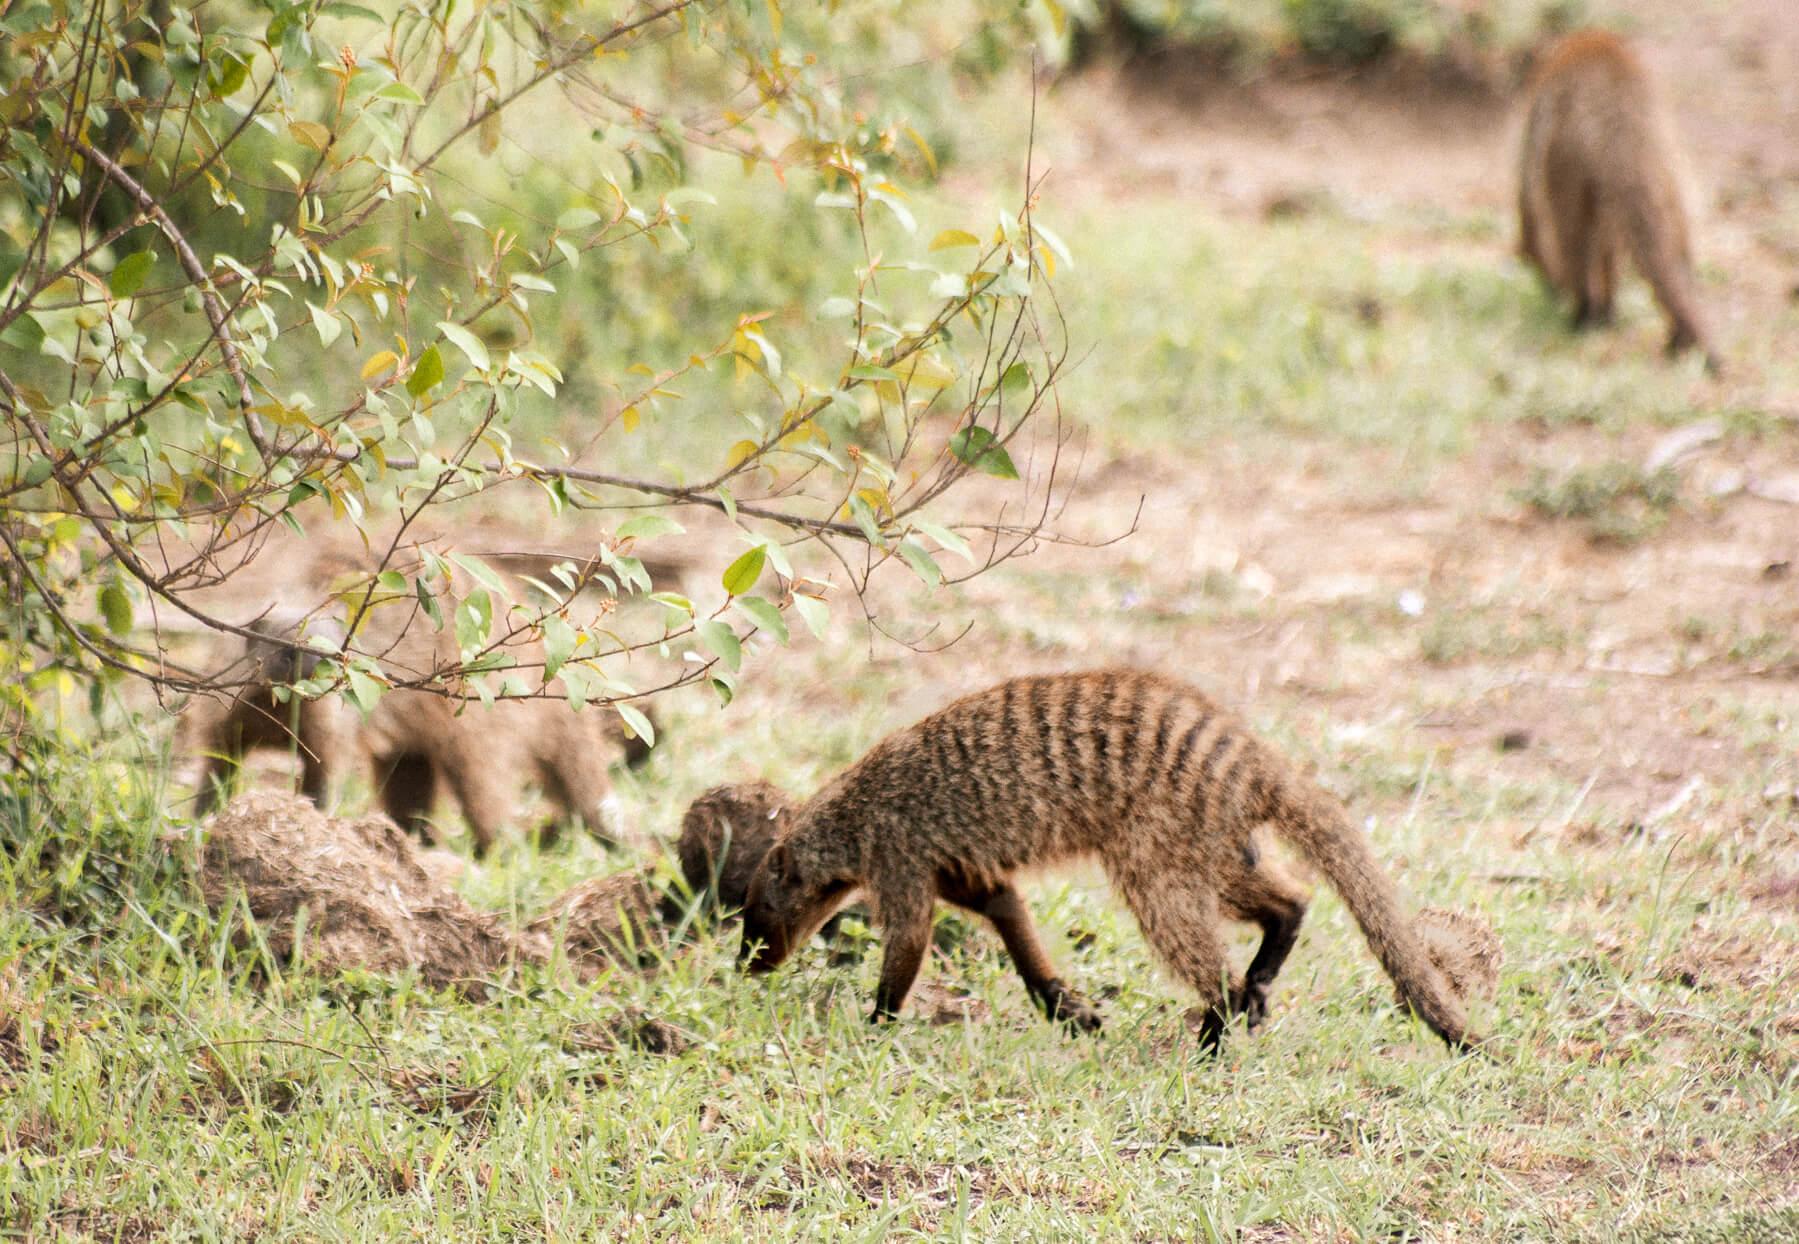 A group of mongoose walking towards a bush